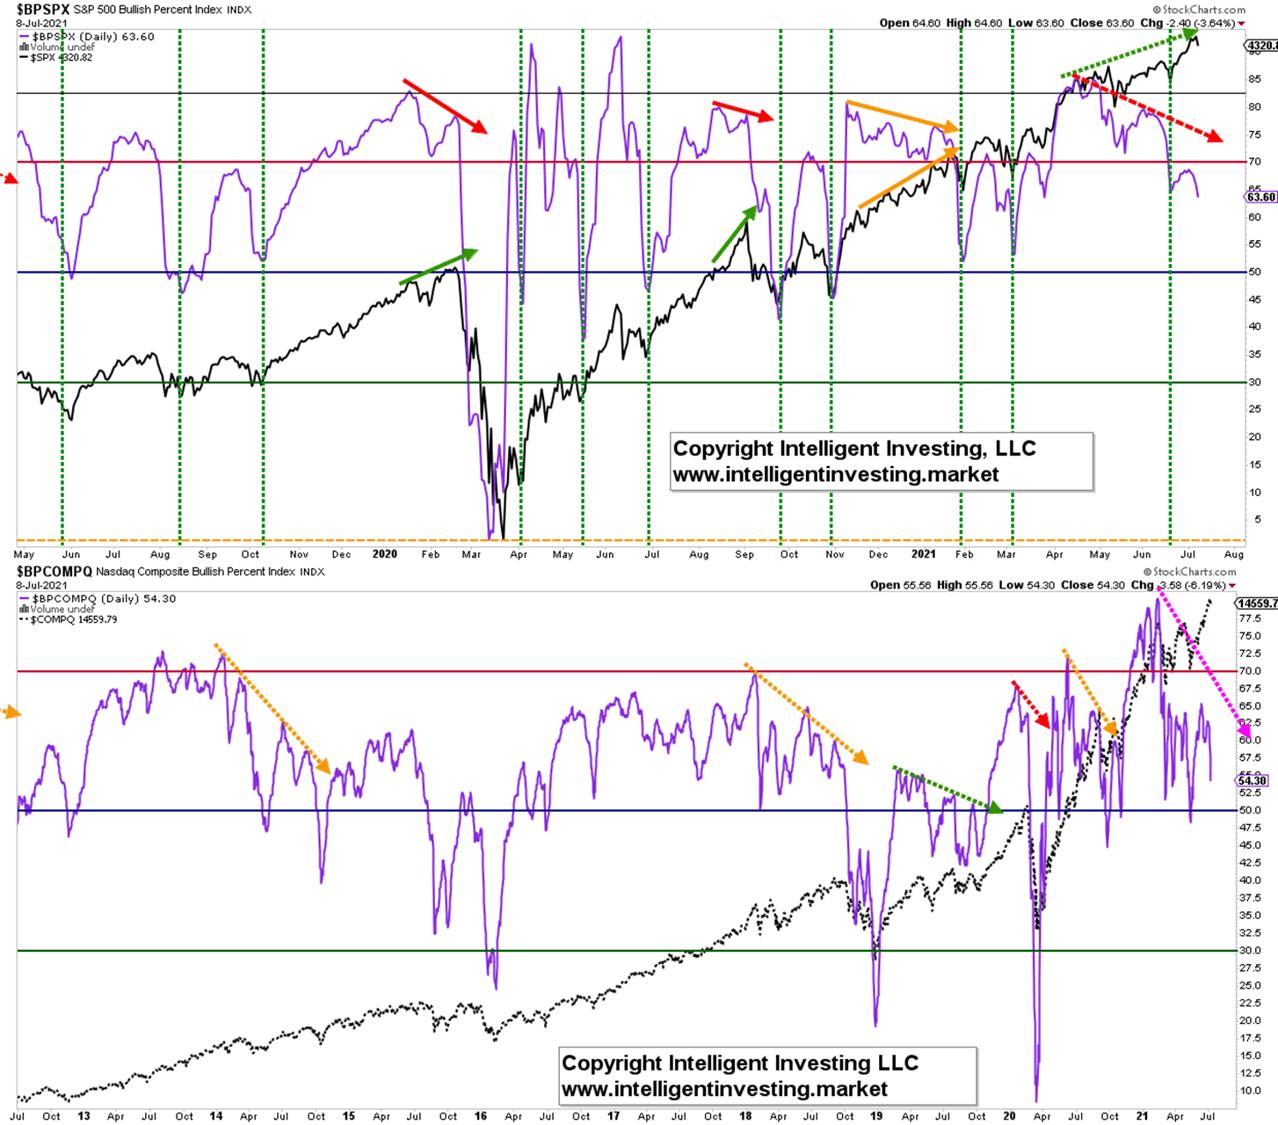 Bullish Percent Index Charts for the S&P 500 and NASDAQ.